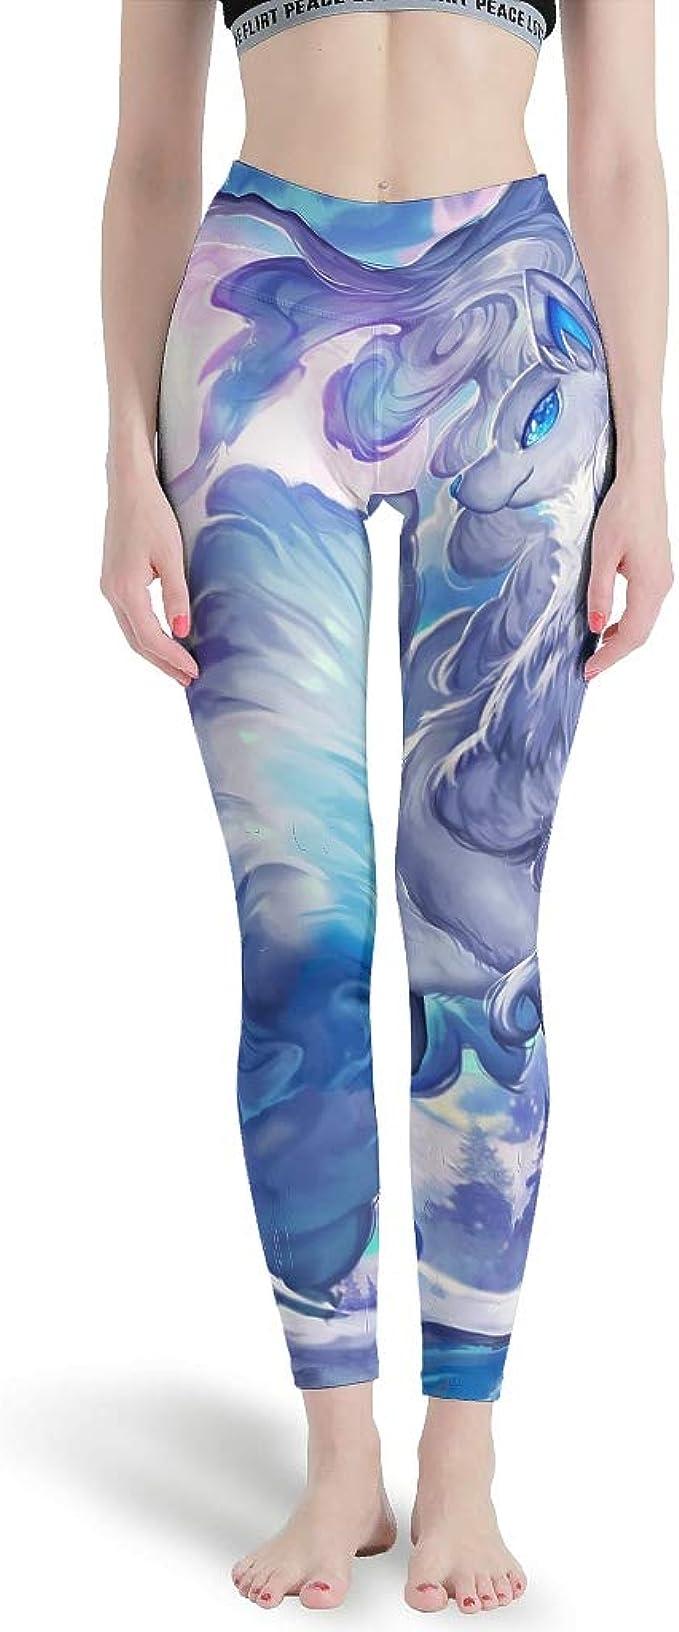 Fox Animal Lovers Yoga Yoga Gift Fox Yoga Yoga Pants No Fox Given Yoga Leggings Leggings Animal Yoga